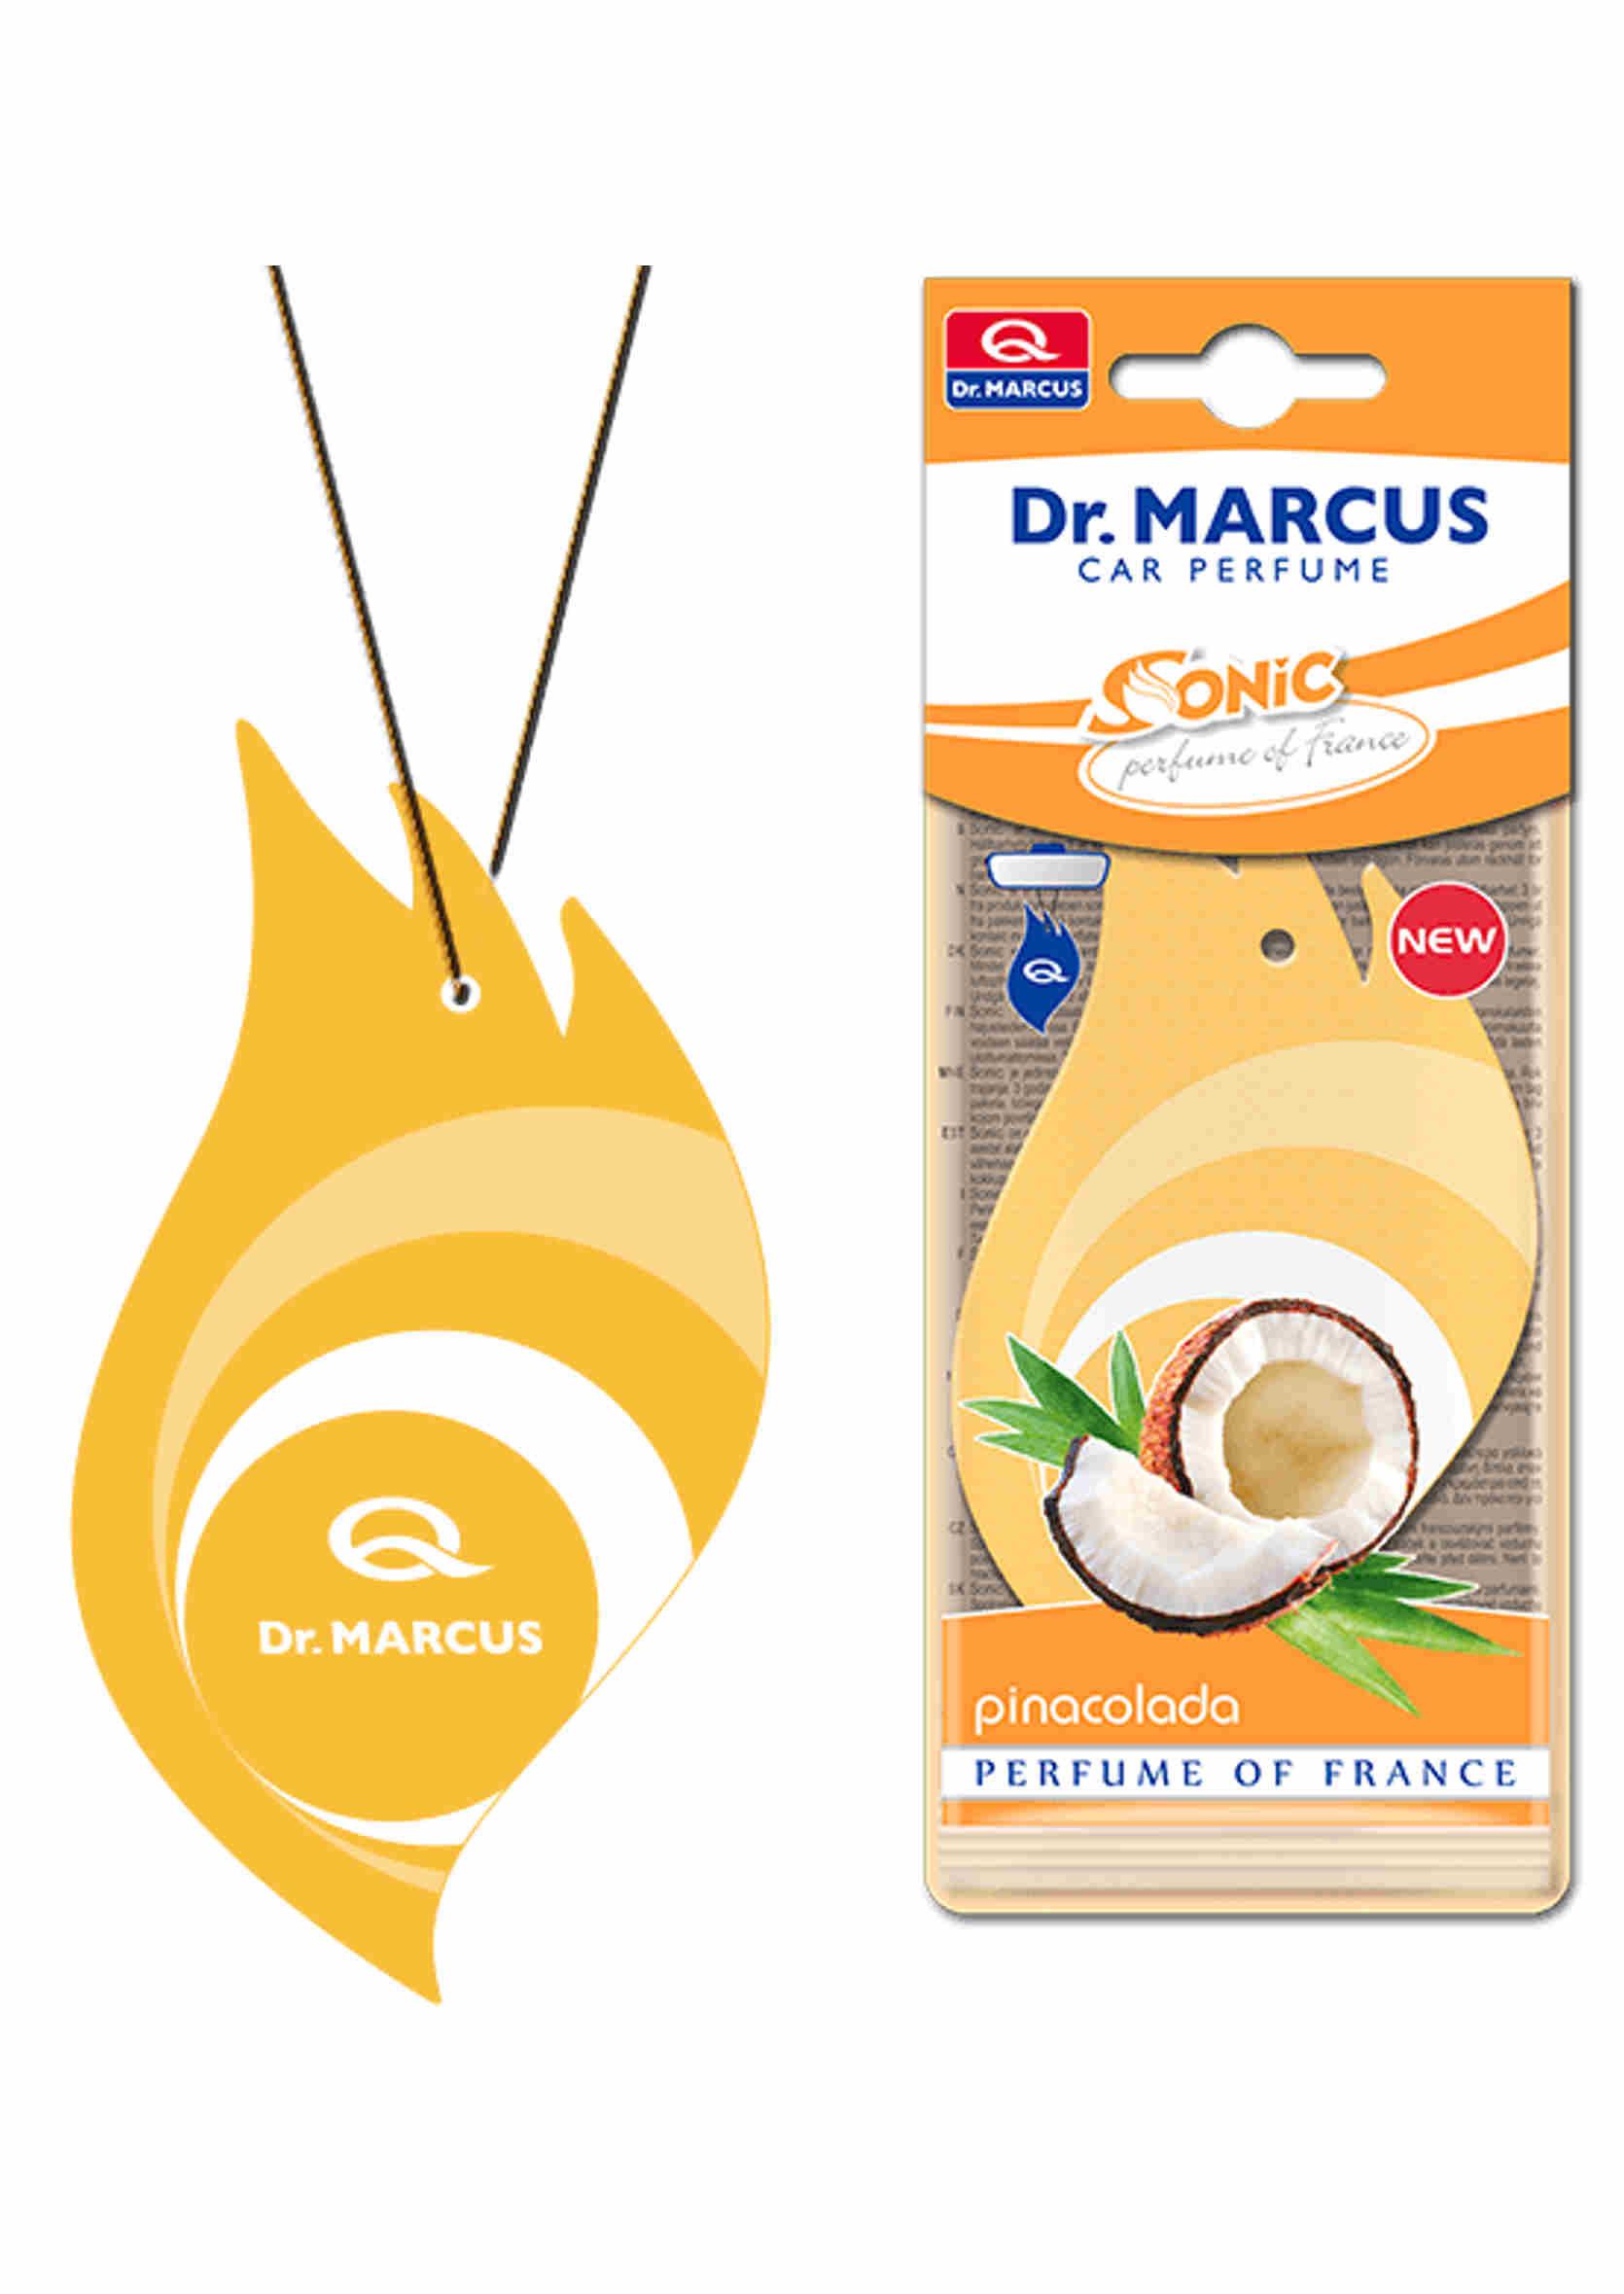 Dr. Marcus Sonic Pinacolada Listek Zapachowy Choinka